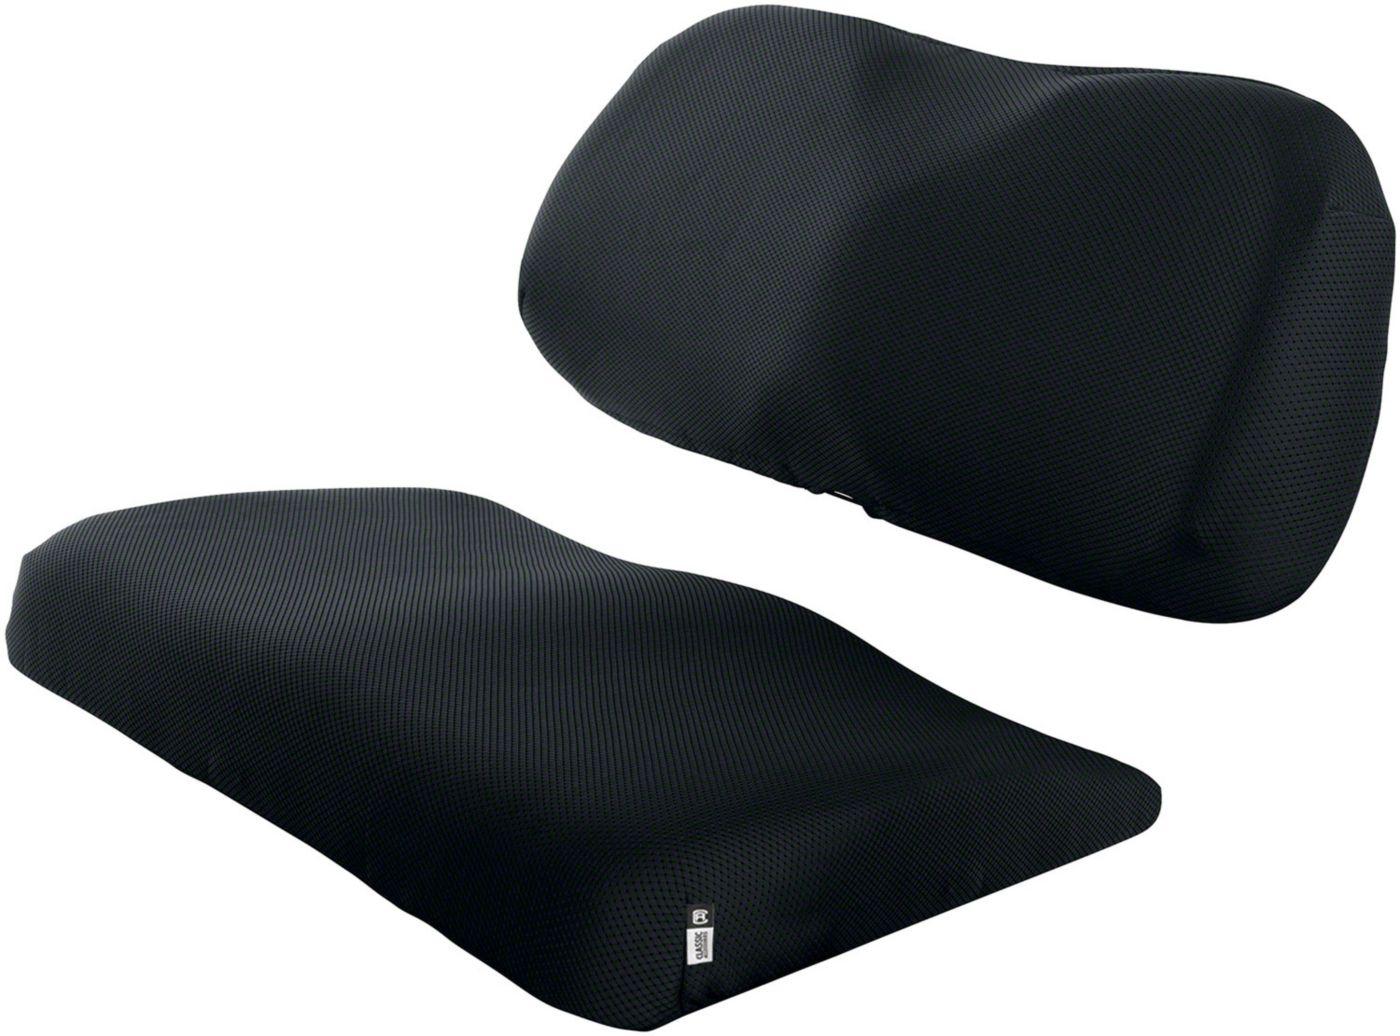 Classic Accessories Fairway Black Diamond Air Mesh Seat Cover